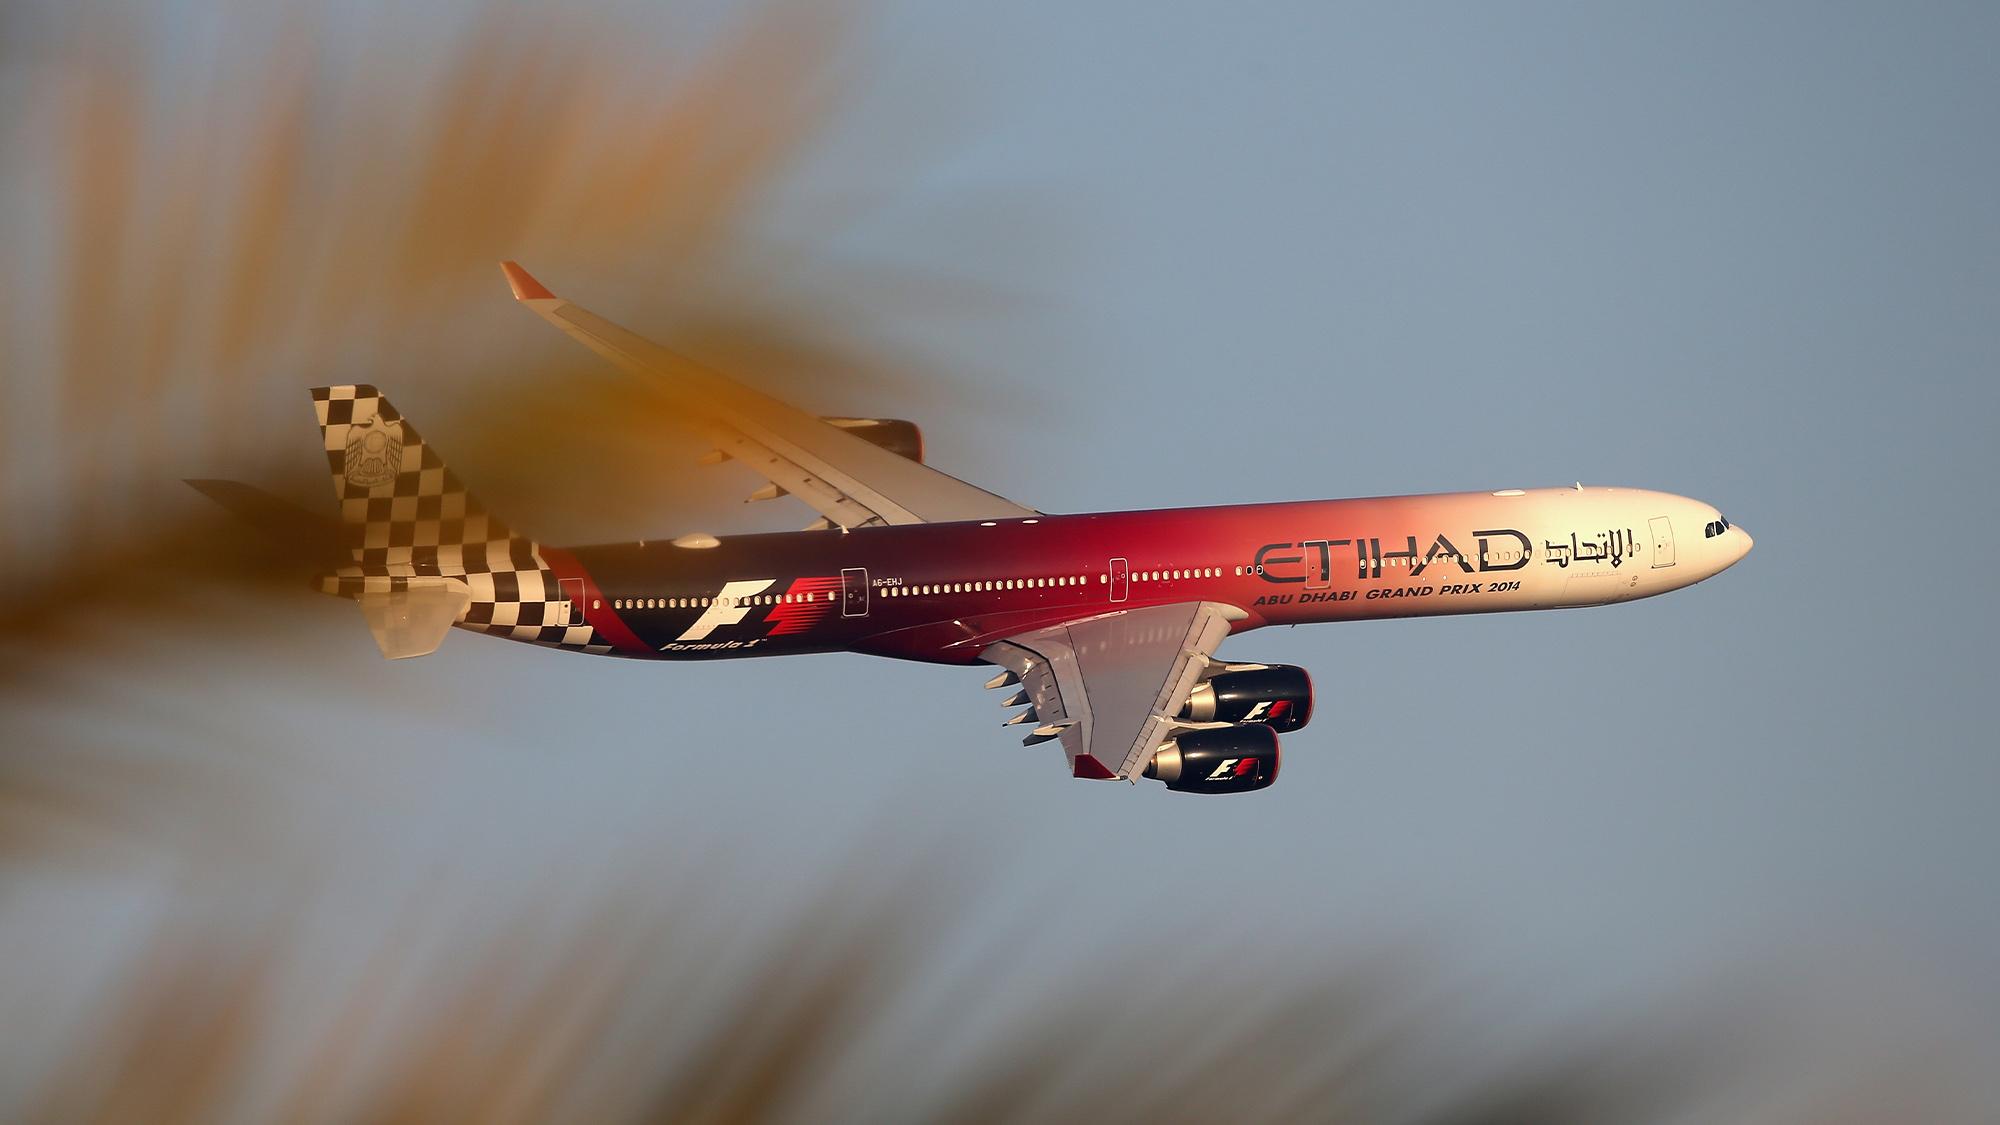 Etihad F1 branded plane in the sky